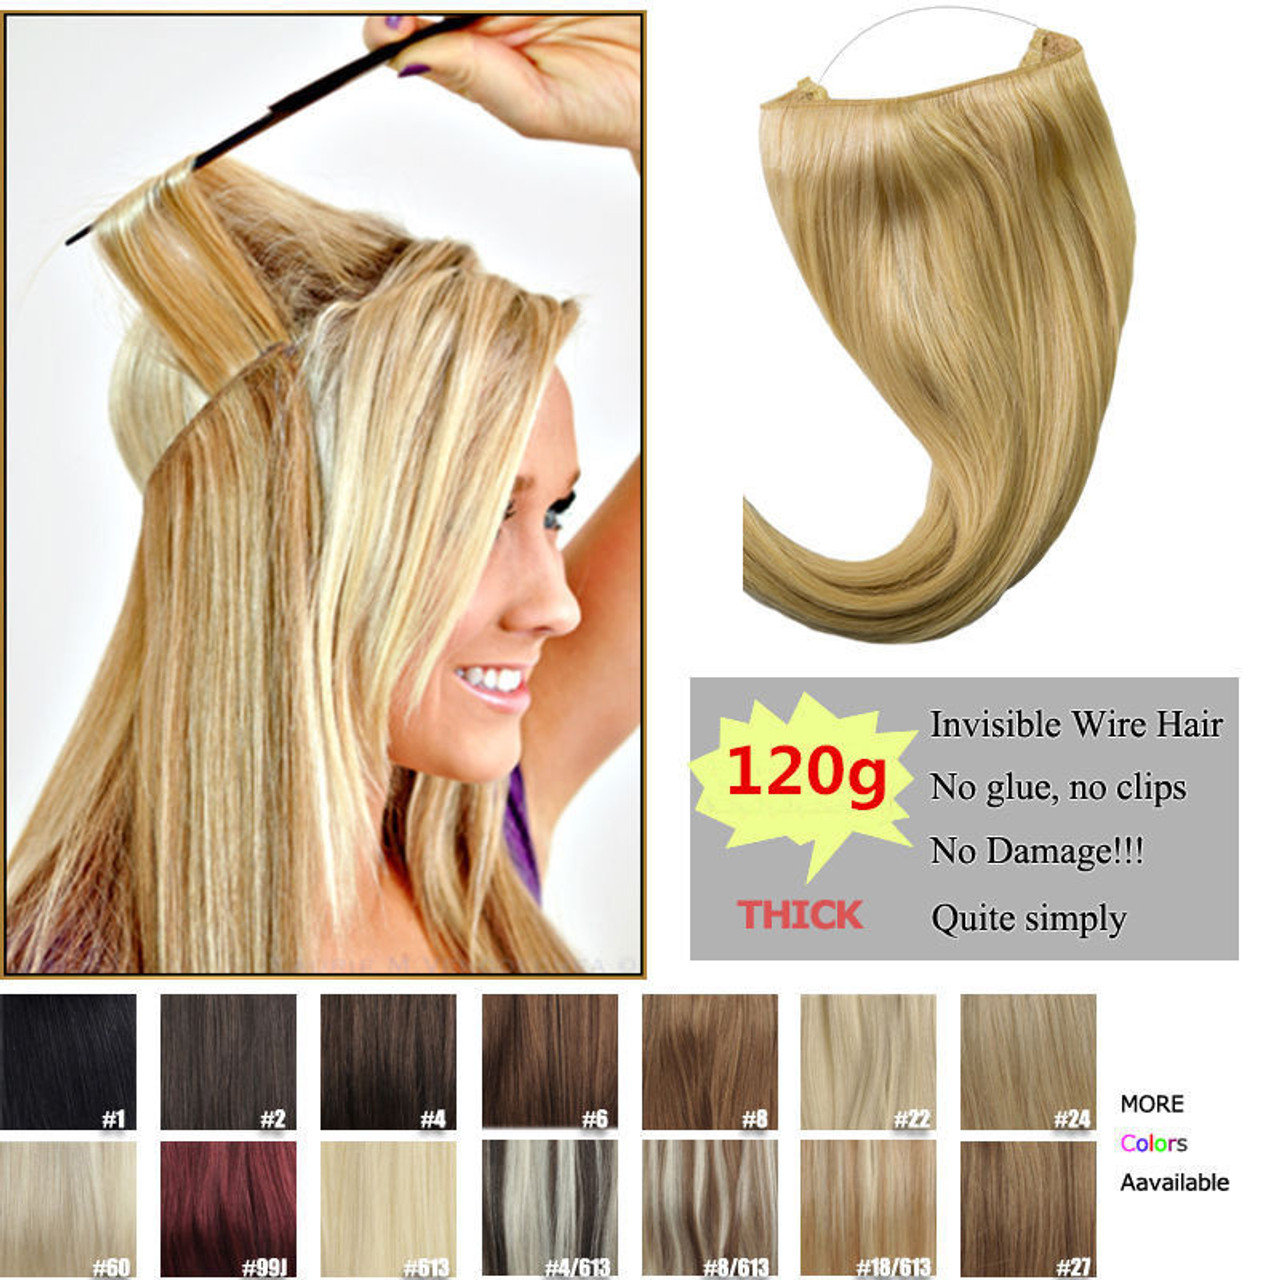 120g thick human remy secret invisible wire secret halo hair remeehi 120g thick human remy secret invisible wire secret halo hair extension any color 28cm pmusecretfo Gallery